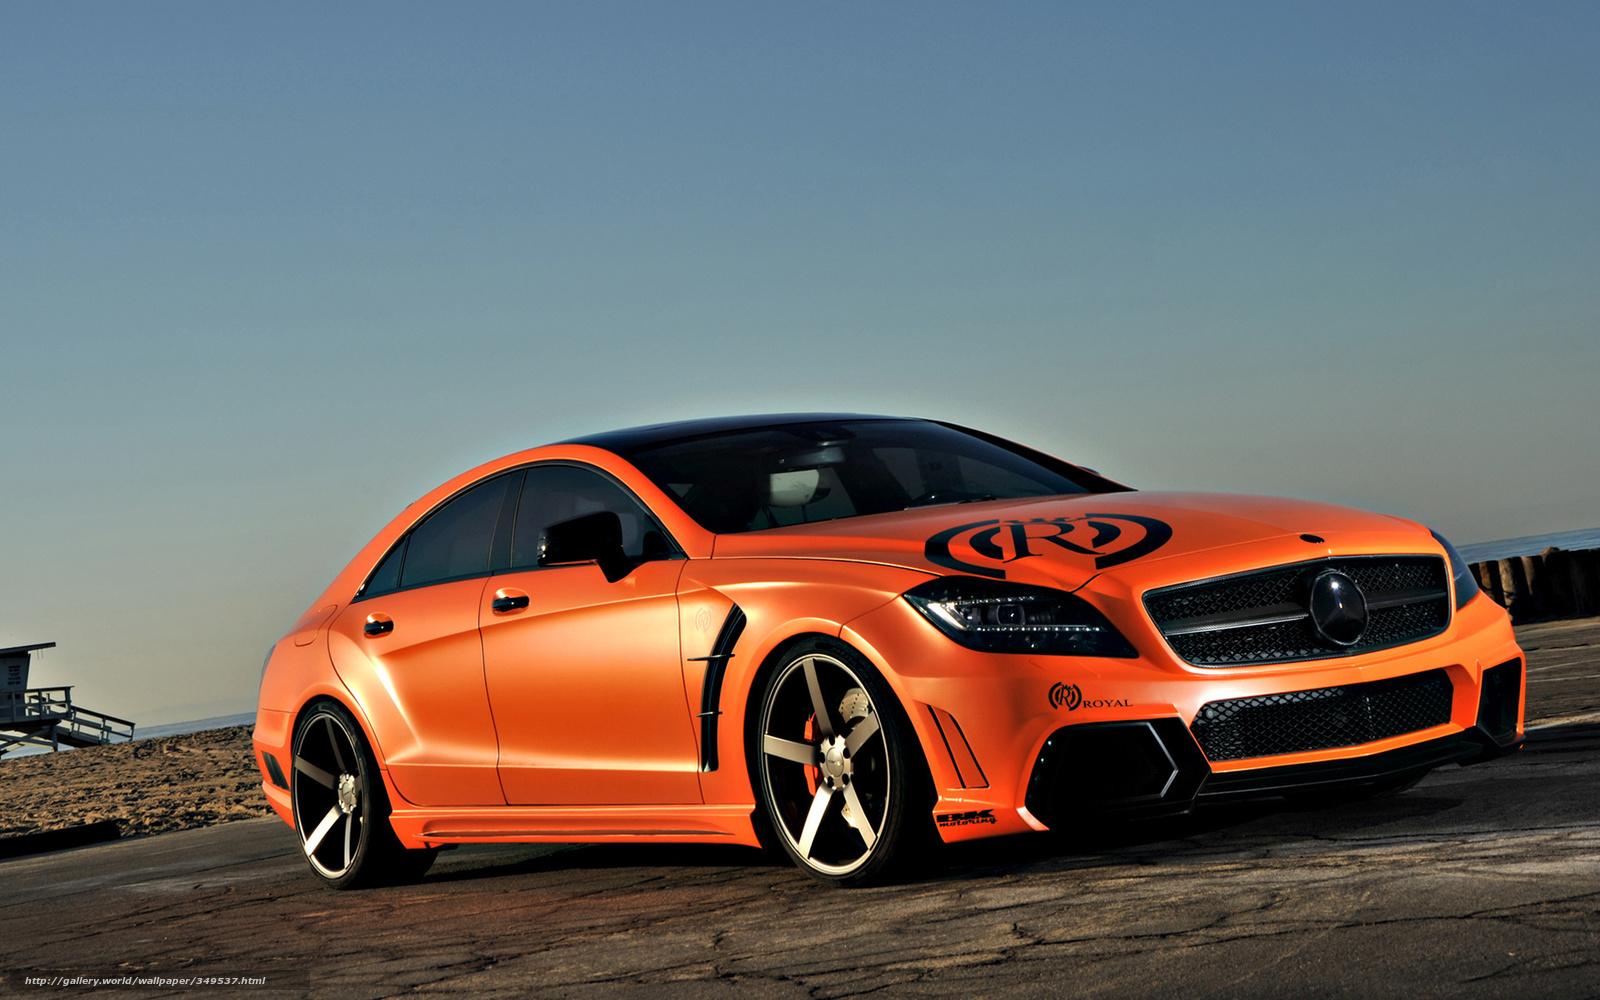 Mercedes-Benz, CLS, Royal, мерседес, оранжевый ...: koto-fot.ru/gdefon/kotofots/full/349537-kotofotsfull